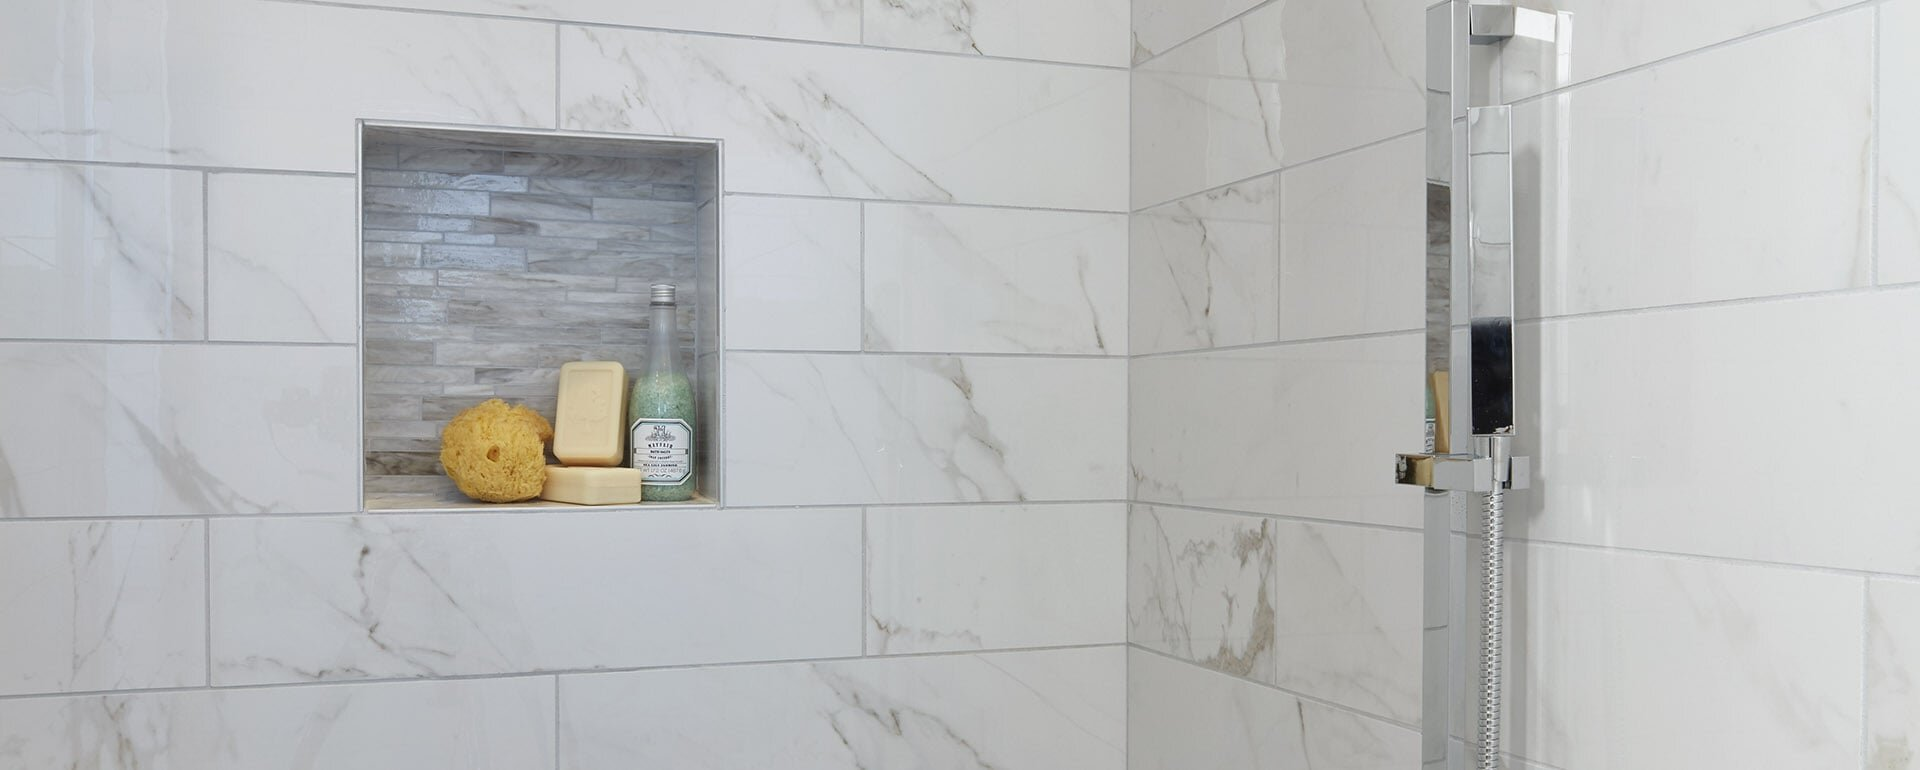 Shower Storage Ideas Options Tile Lines